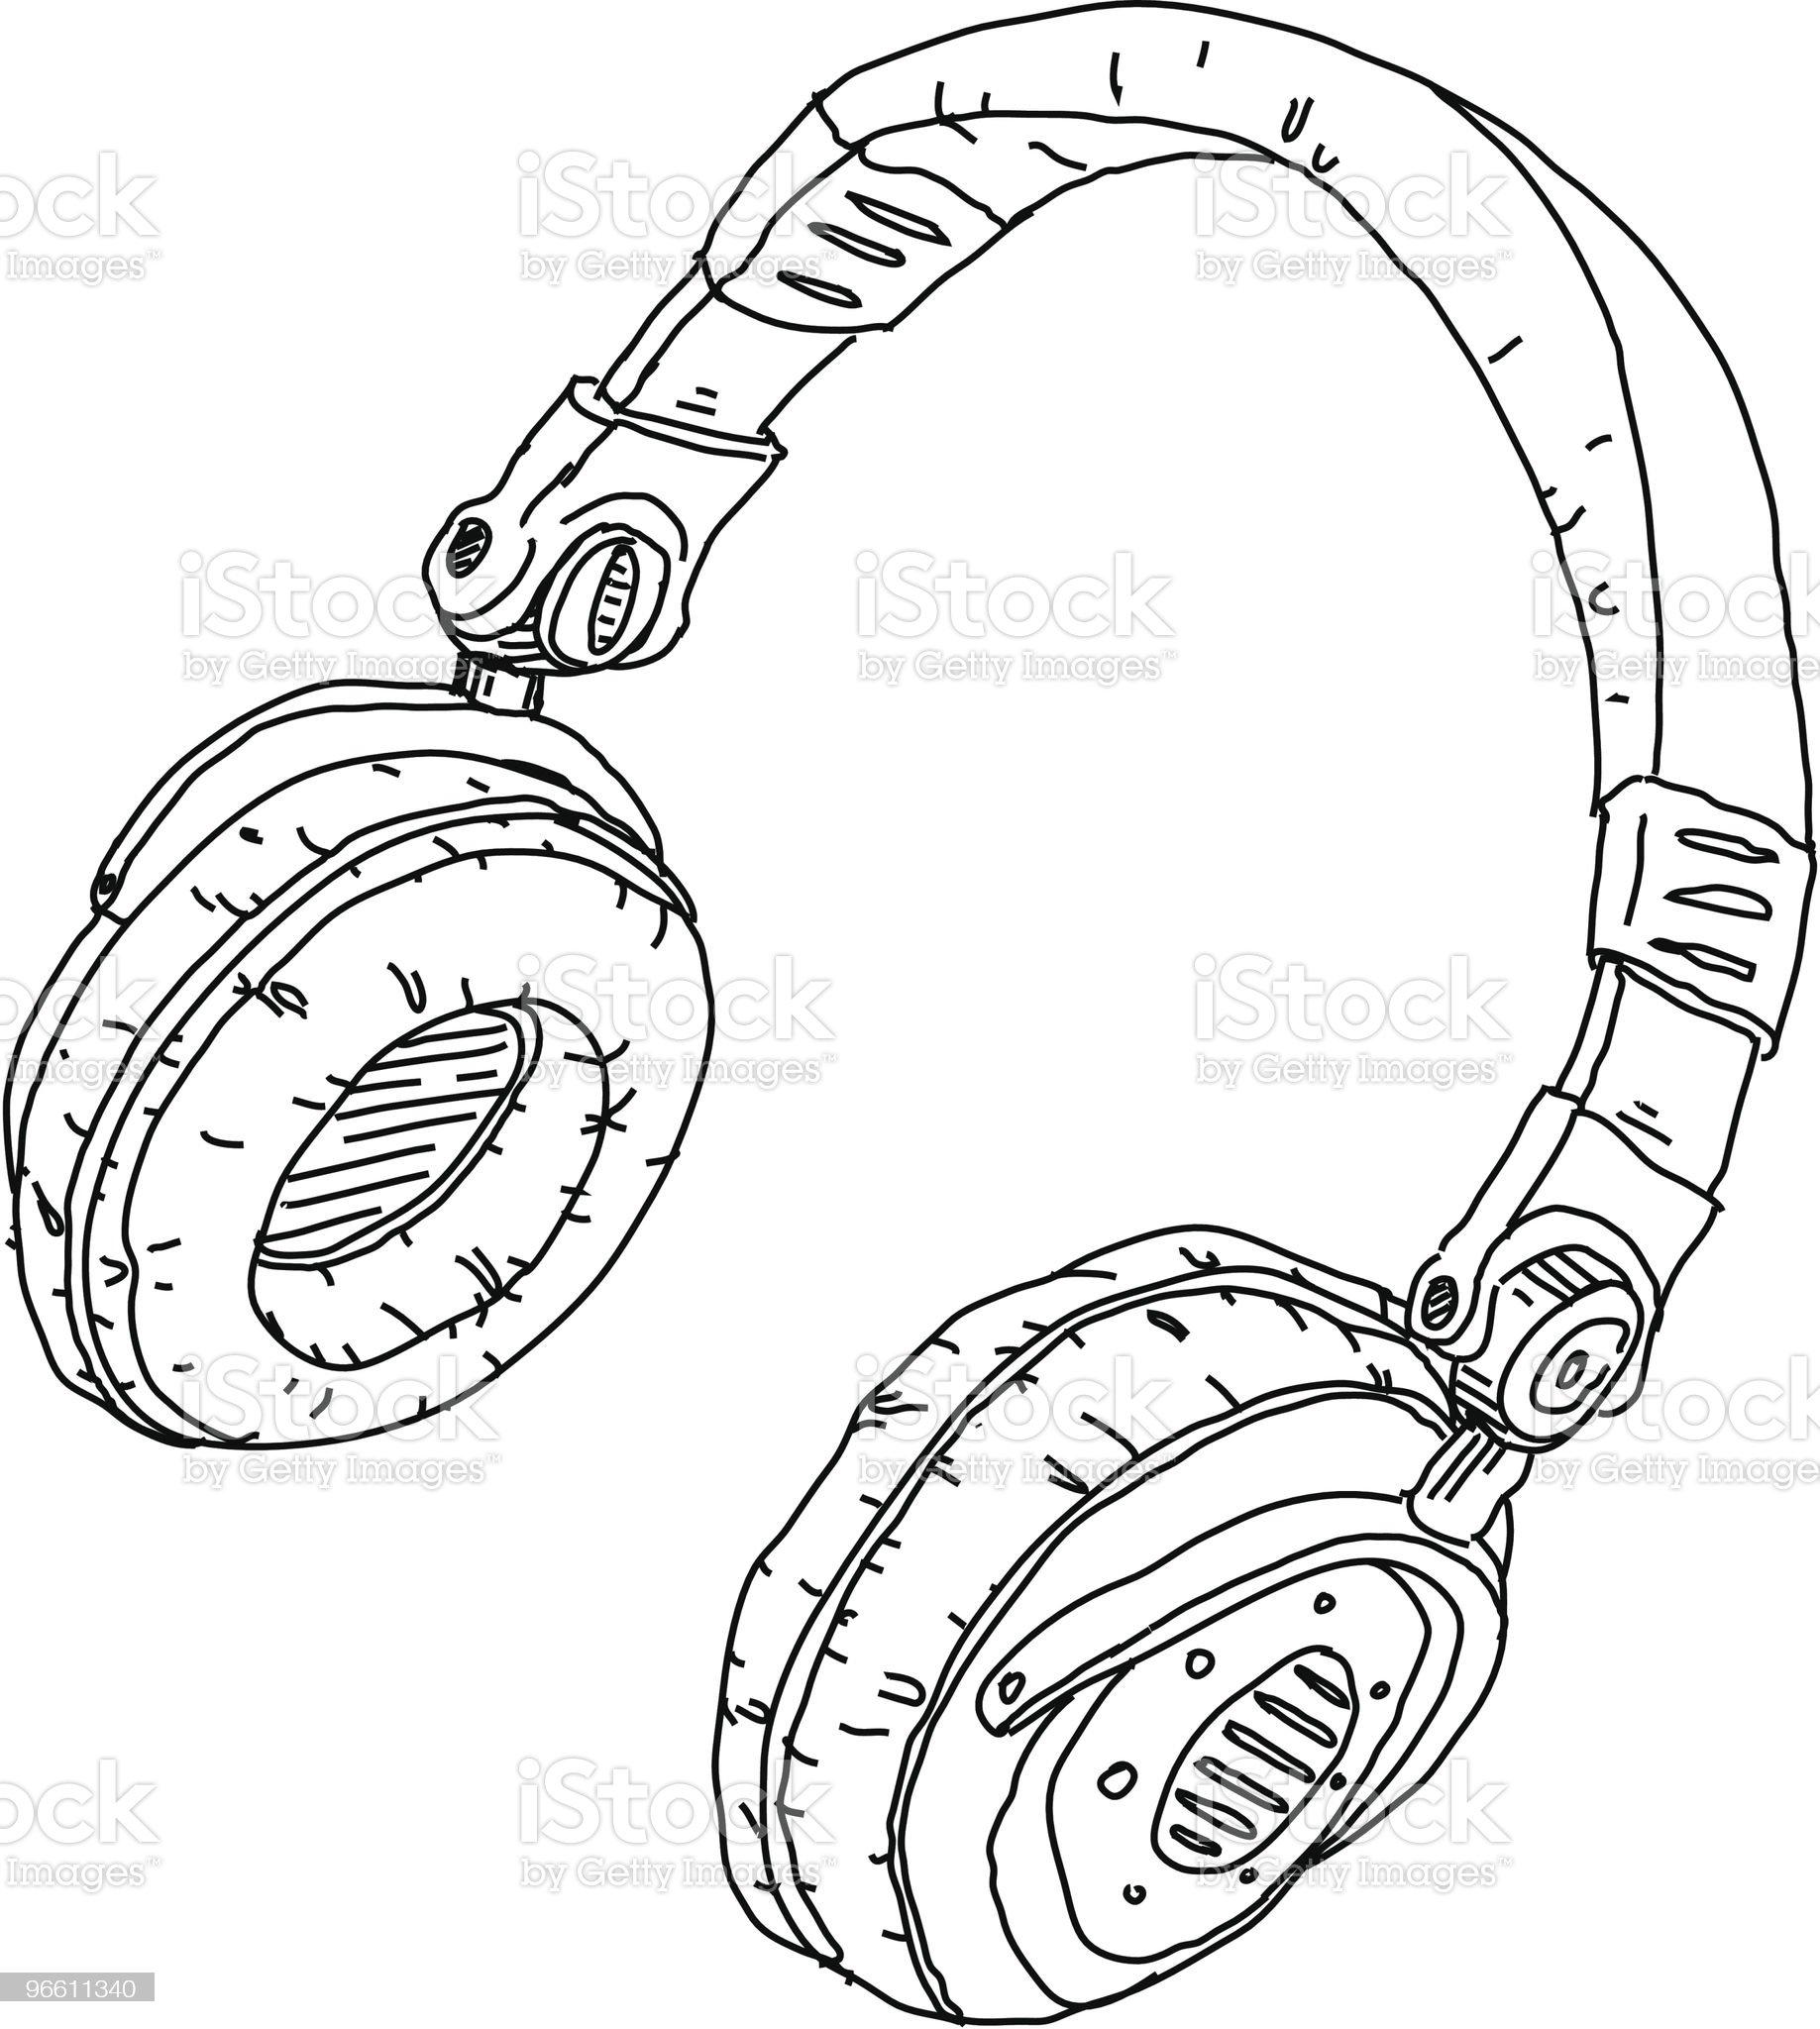 Headphones royalty-free stock vector art